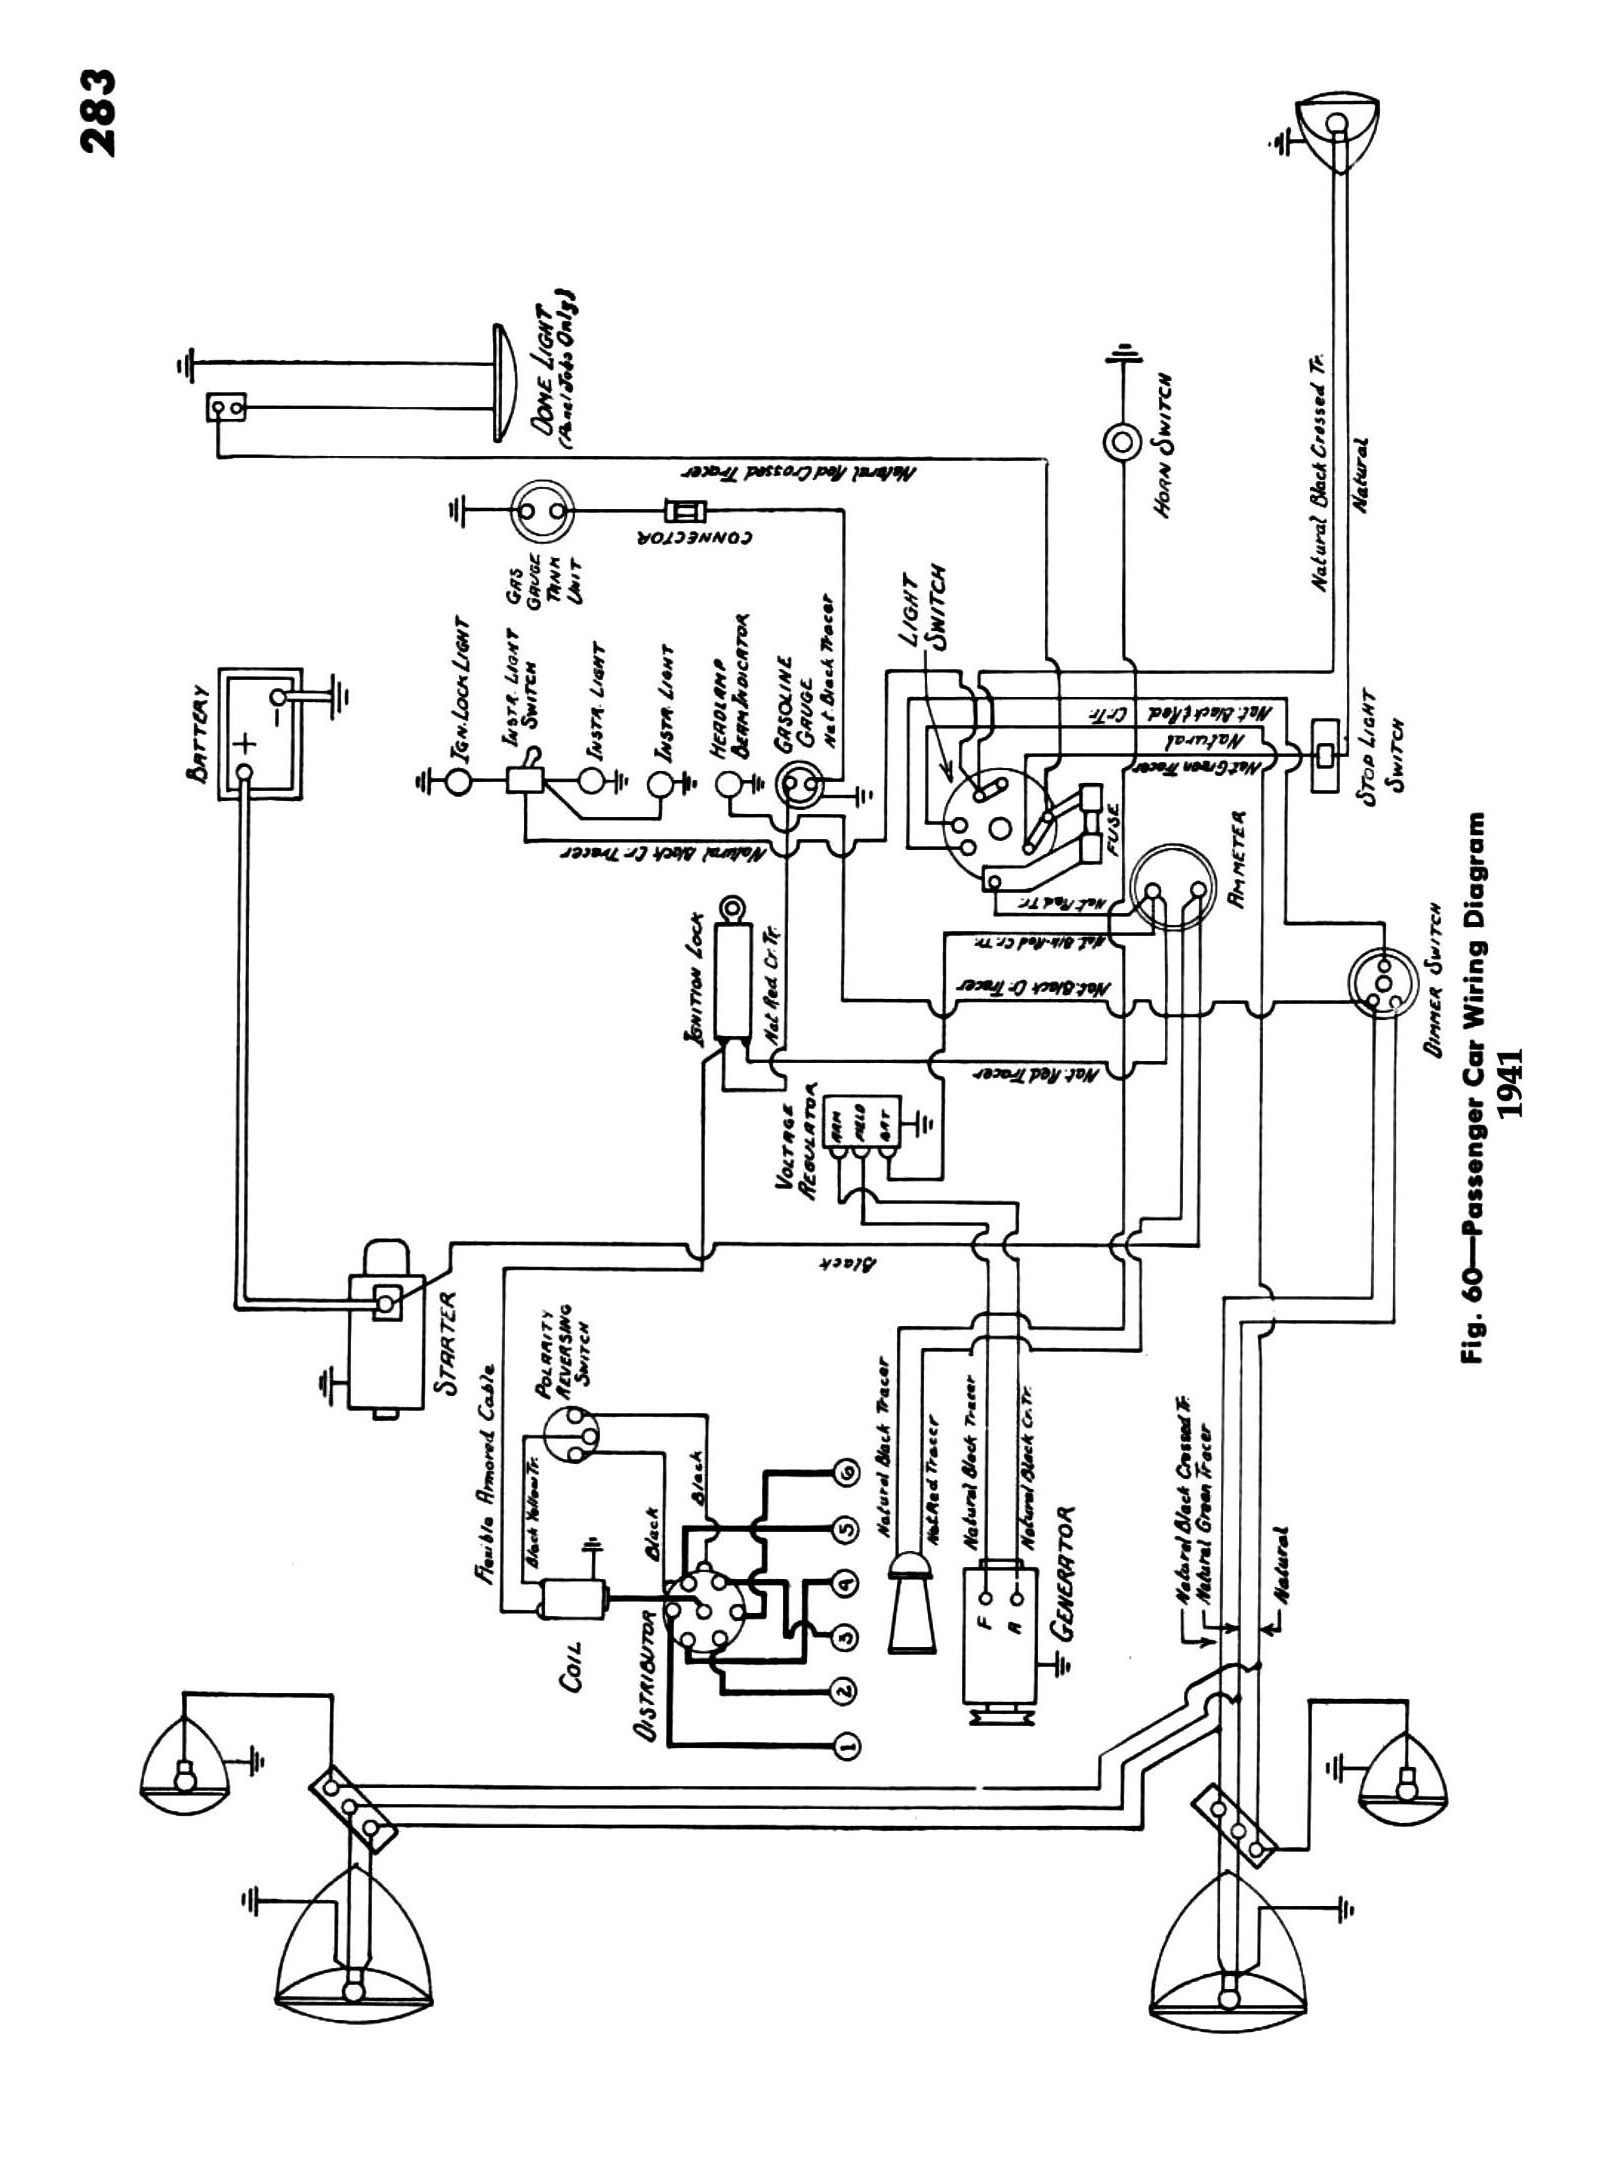 87 Chevy Truck Wiring Diagram Chevy Wiring Diagrams Of 87 Chevy Truck  Wiring Diagram Suburban Parts